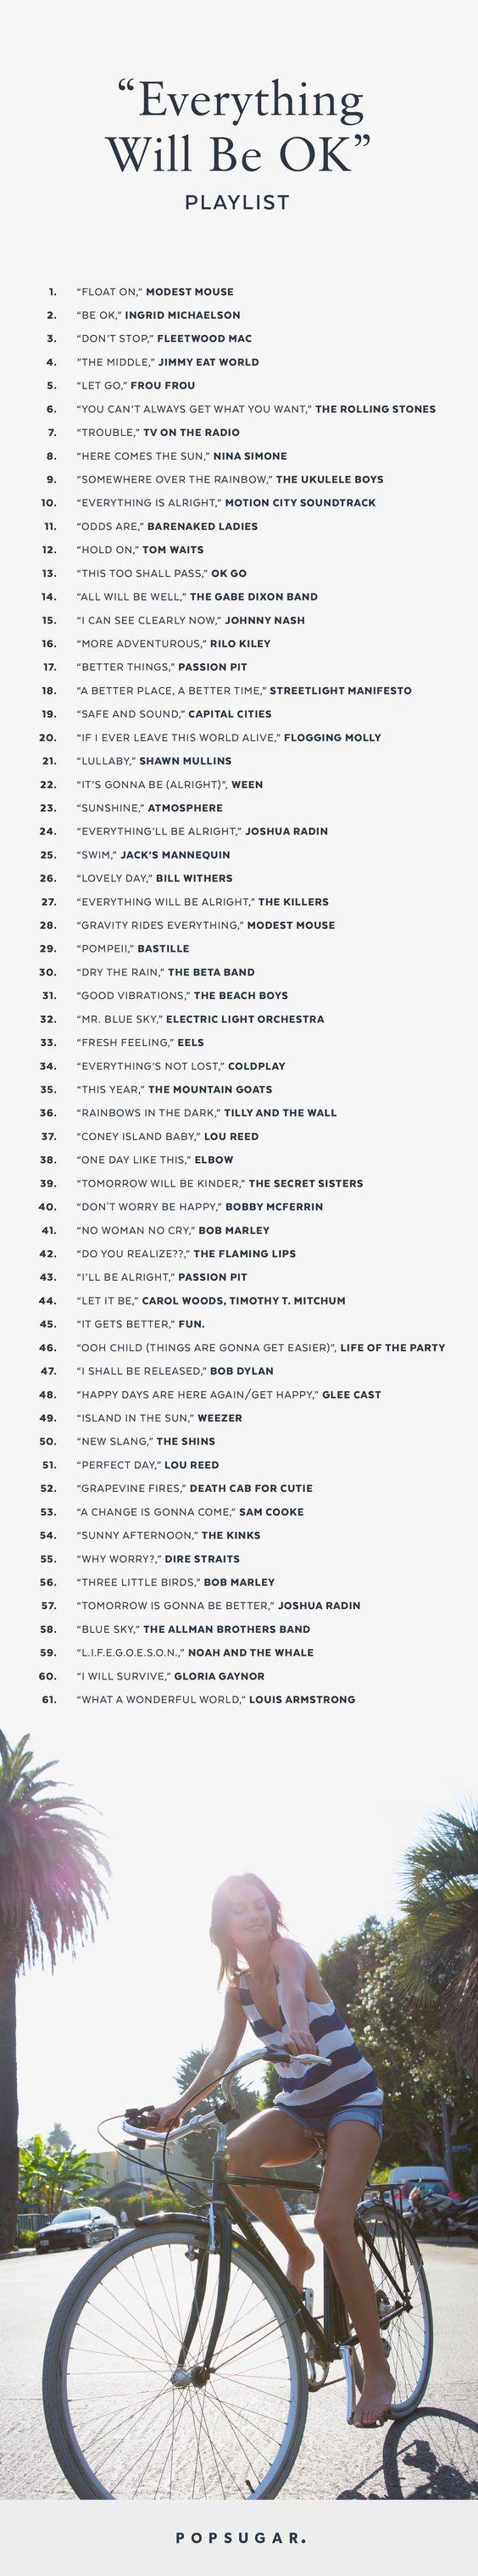 bastille songs playlist